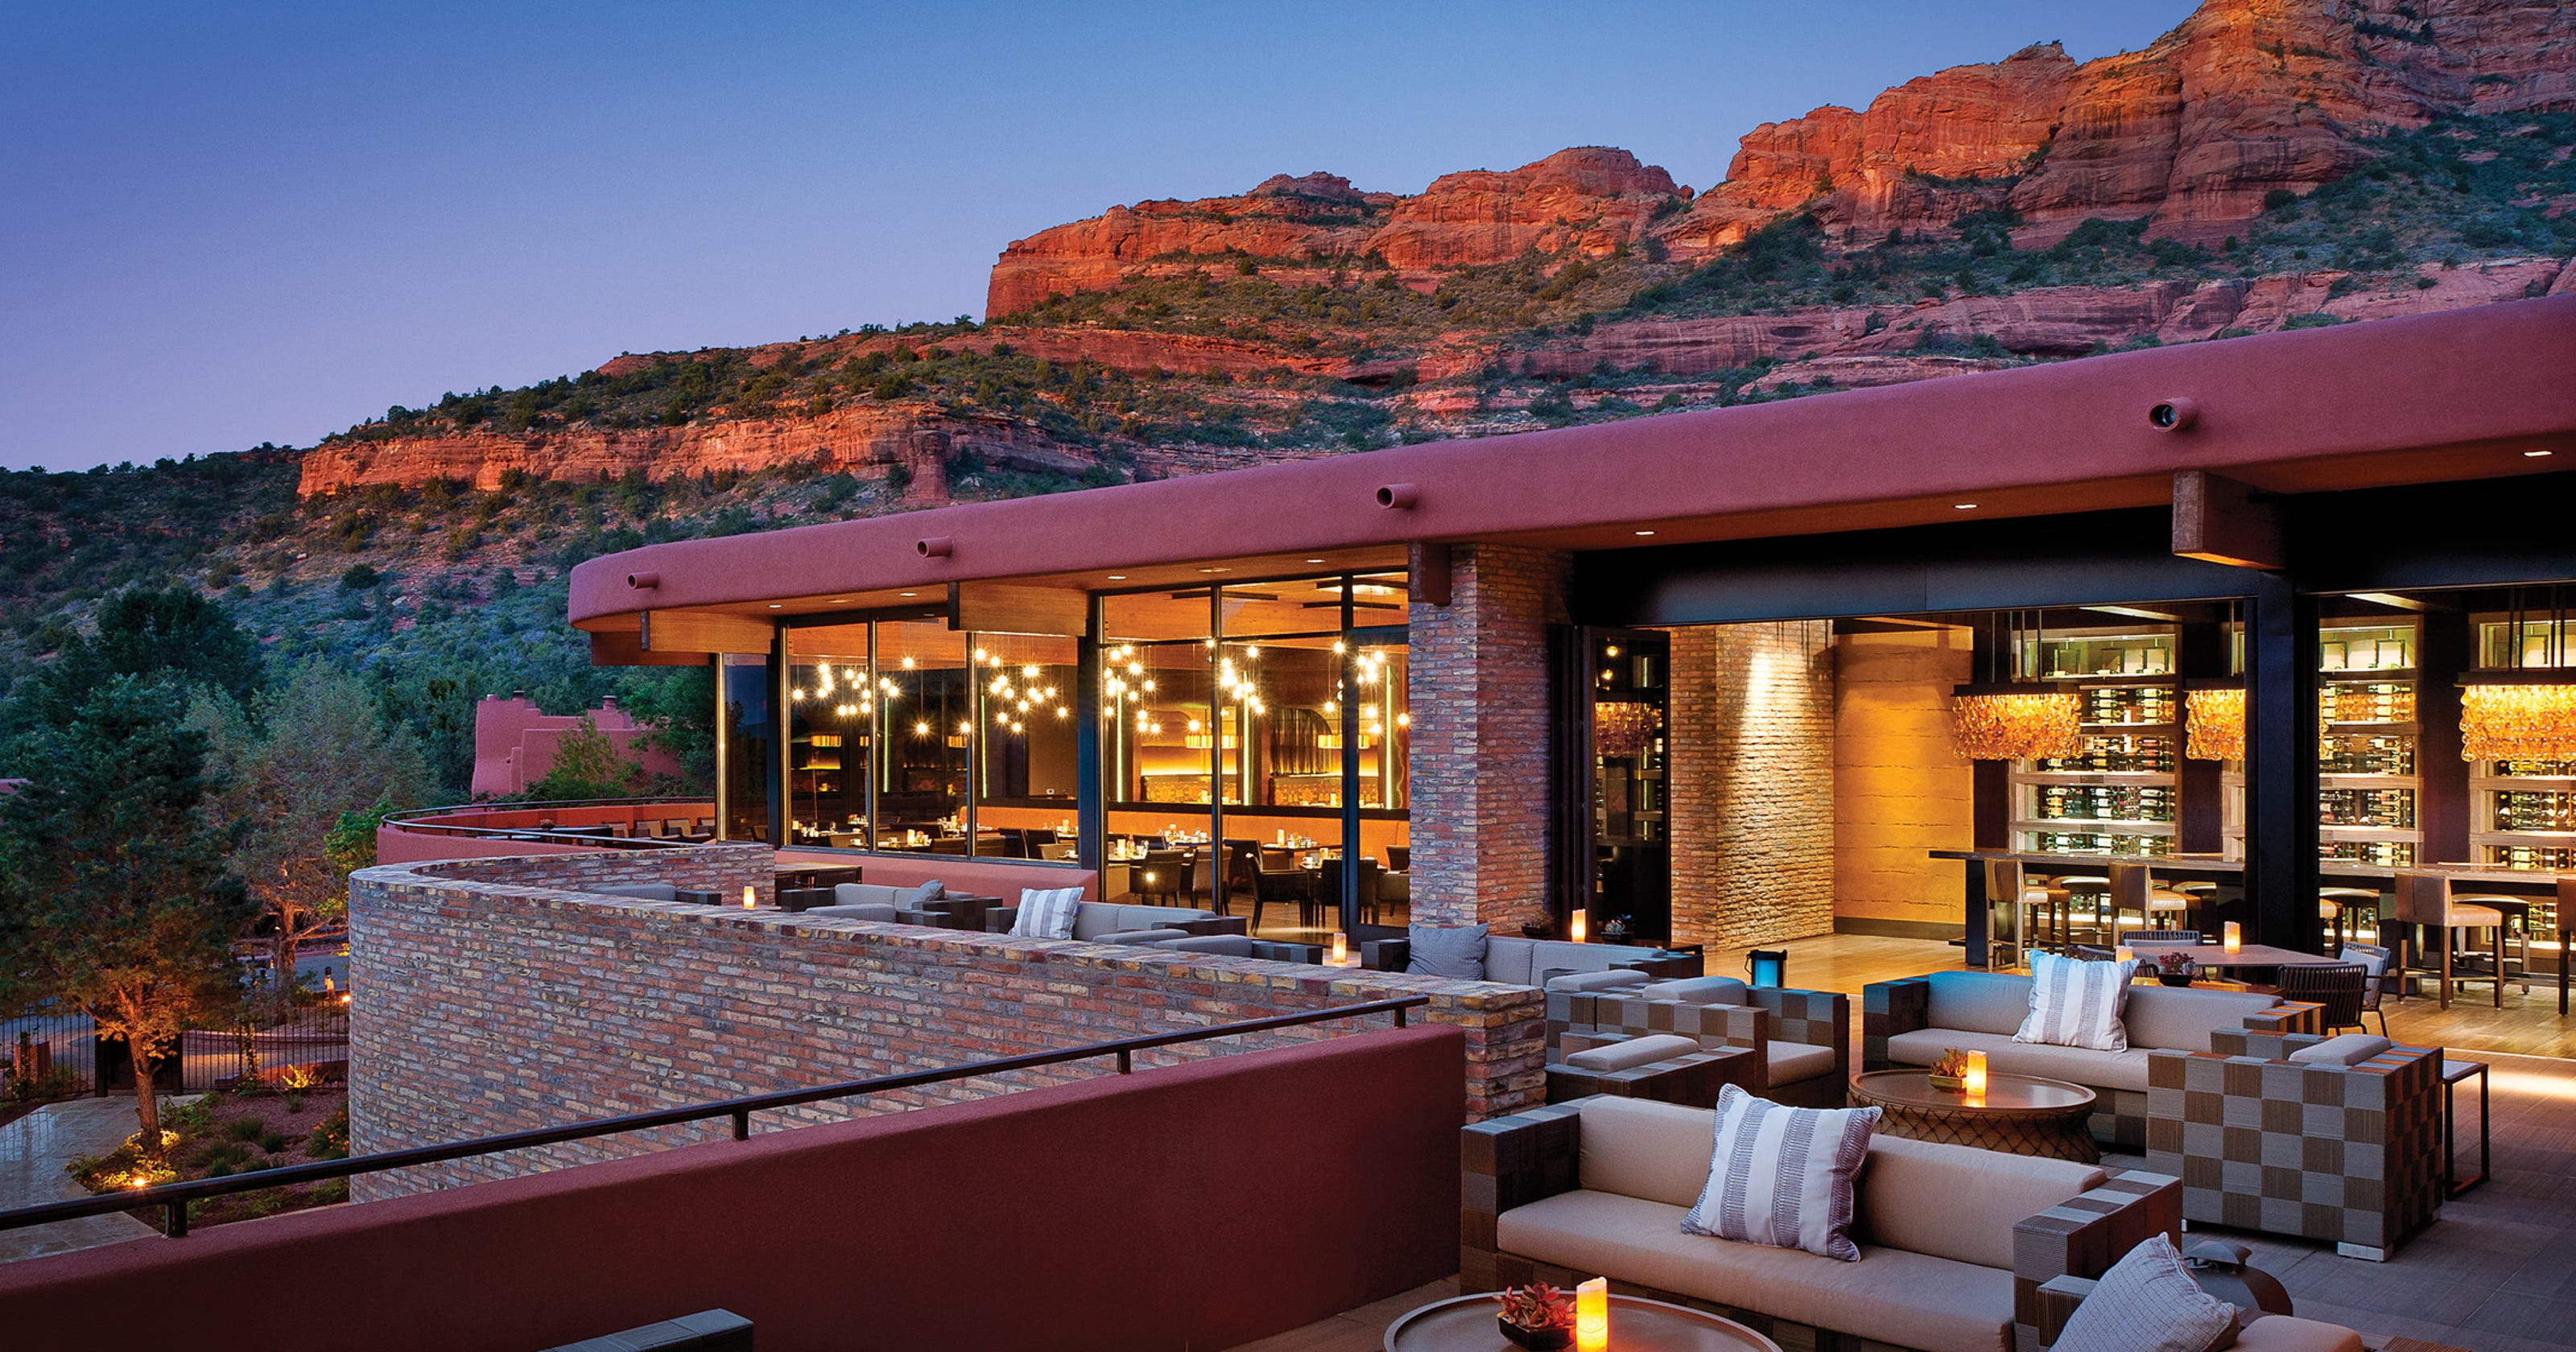 best sedona hotels for almost any budget. Black Bedroom Furniture Sets. Home Design Ideas